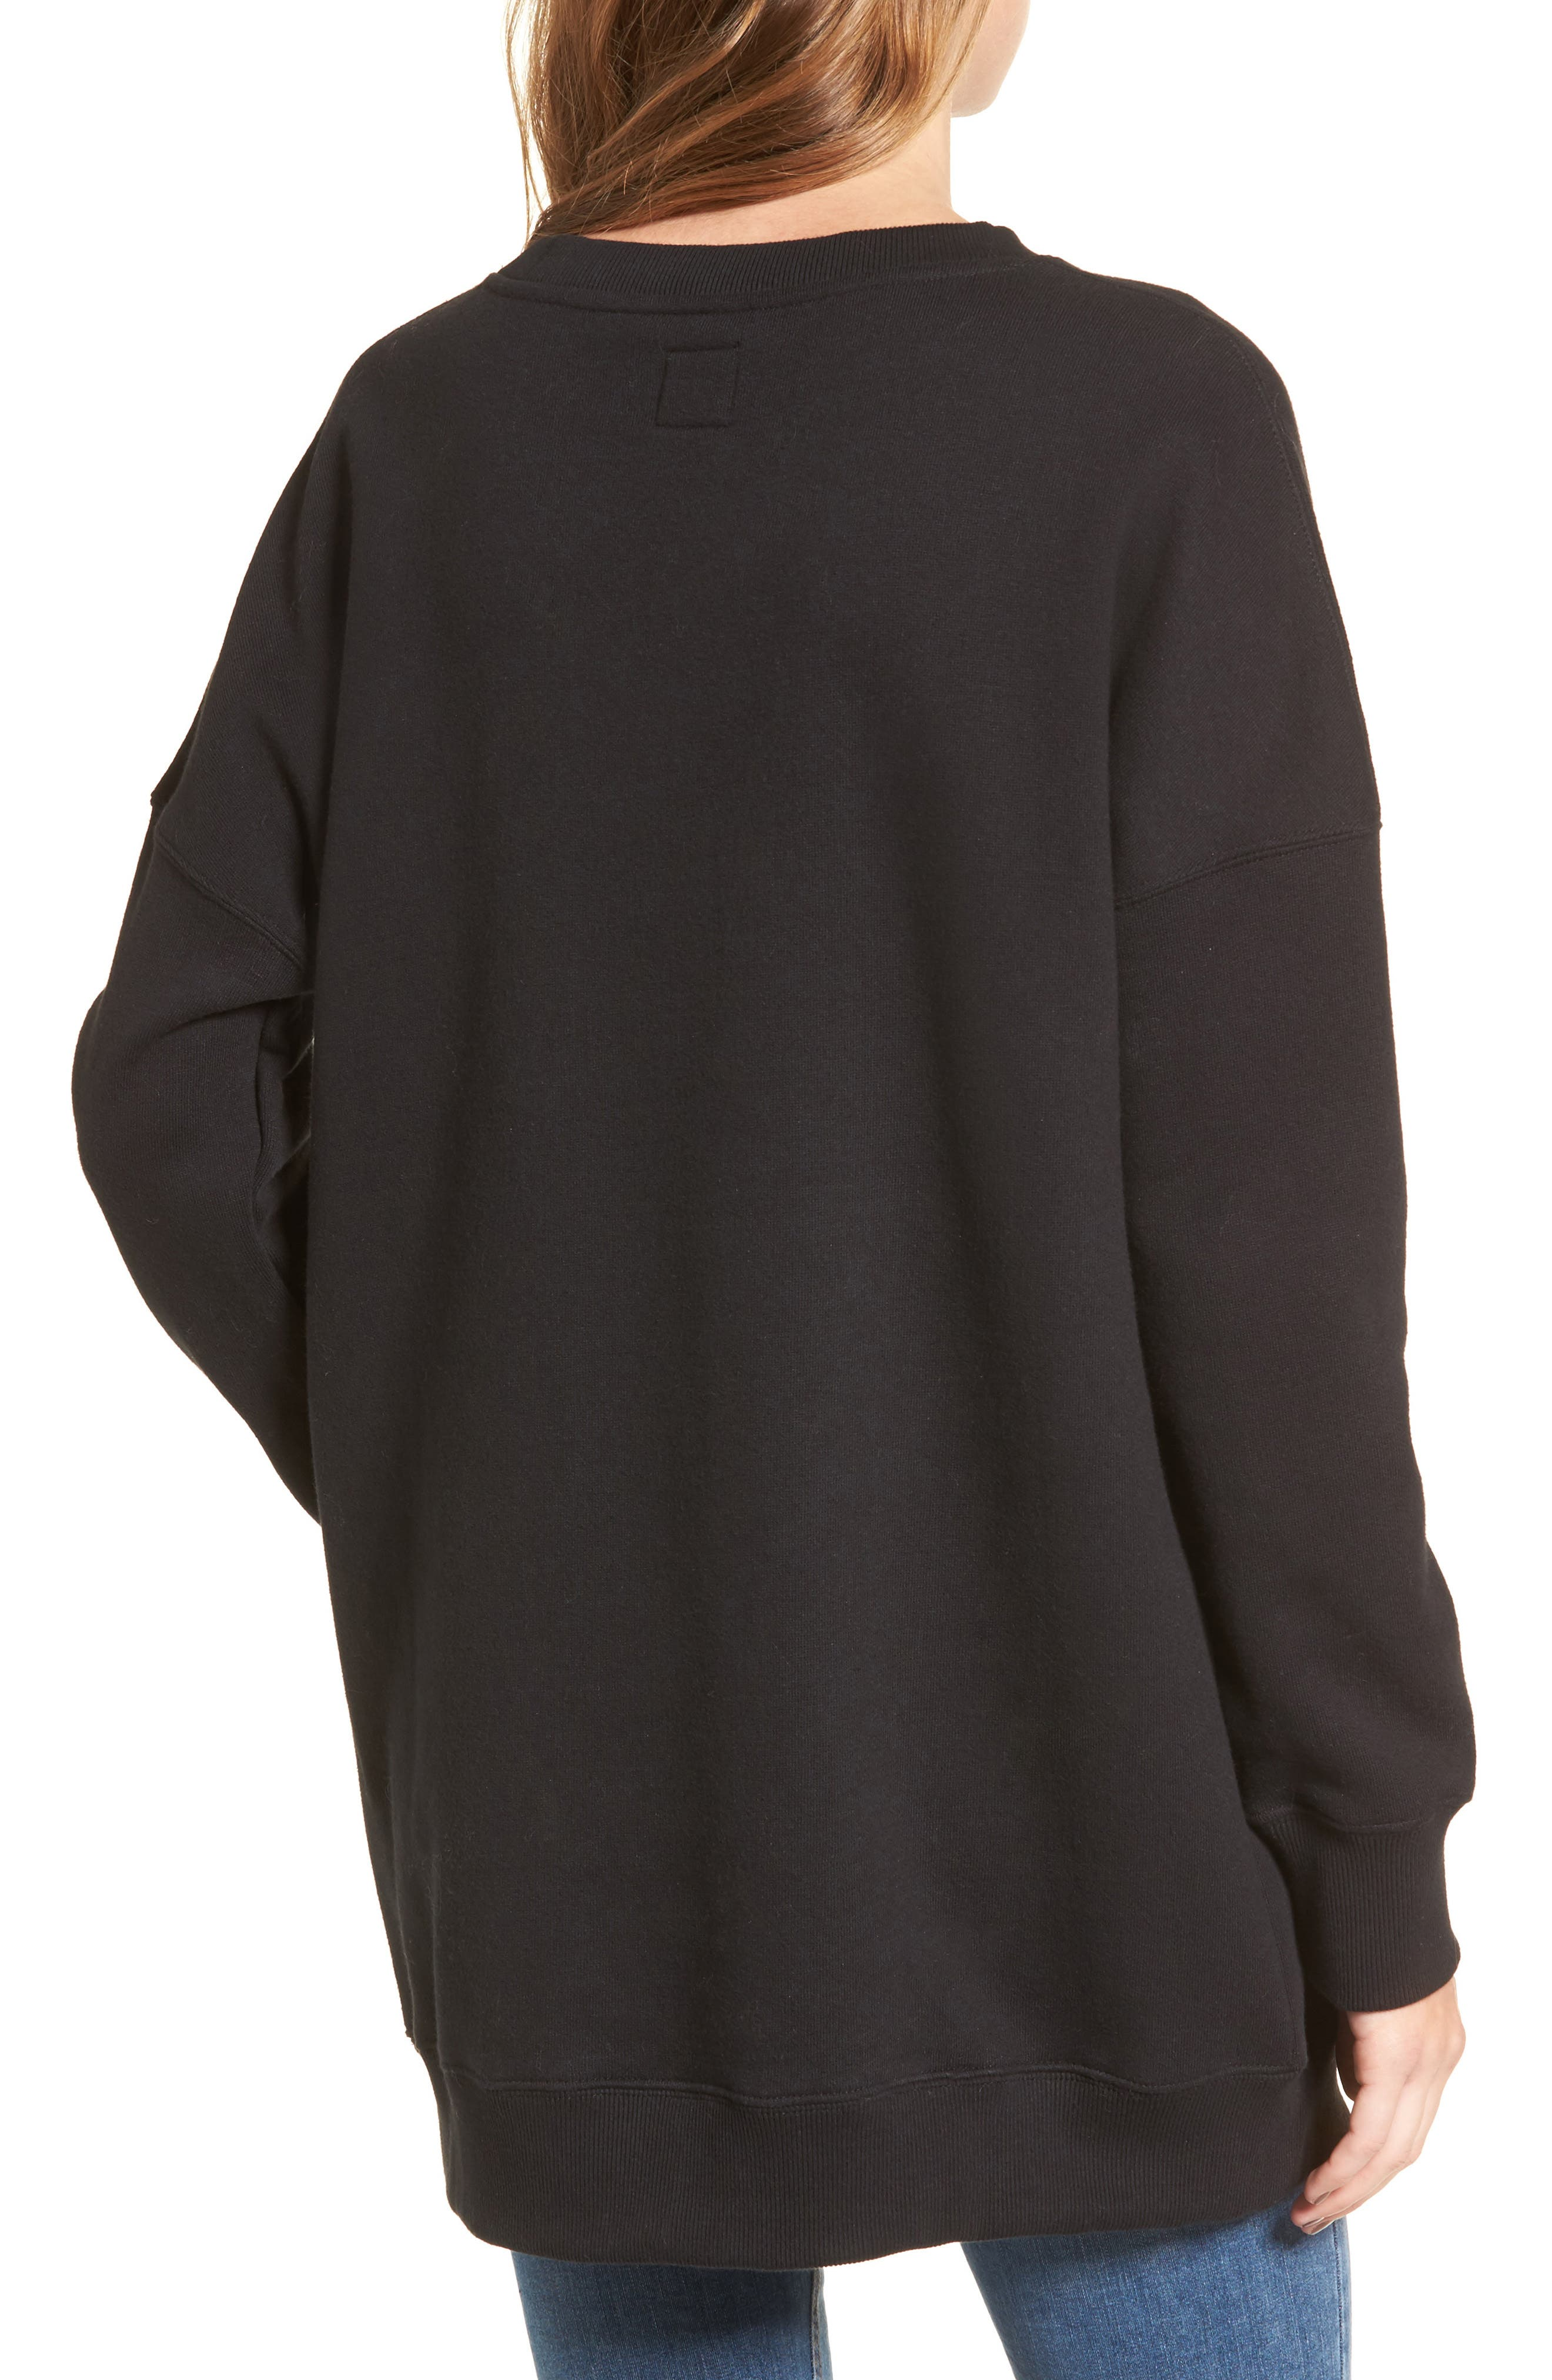 Me Too Sweatshirt,                             Alternate thumbnail 2, color,                             001